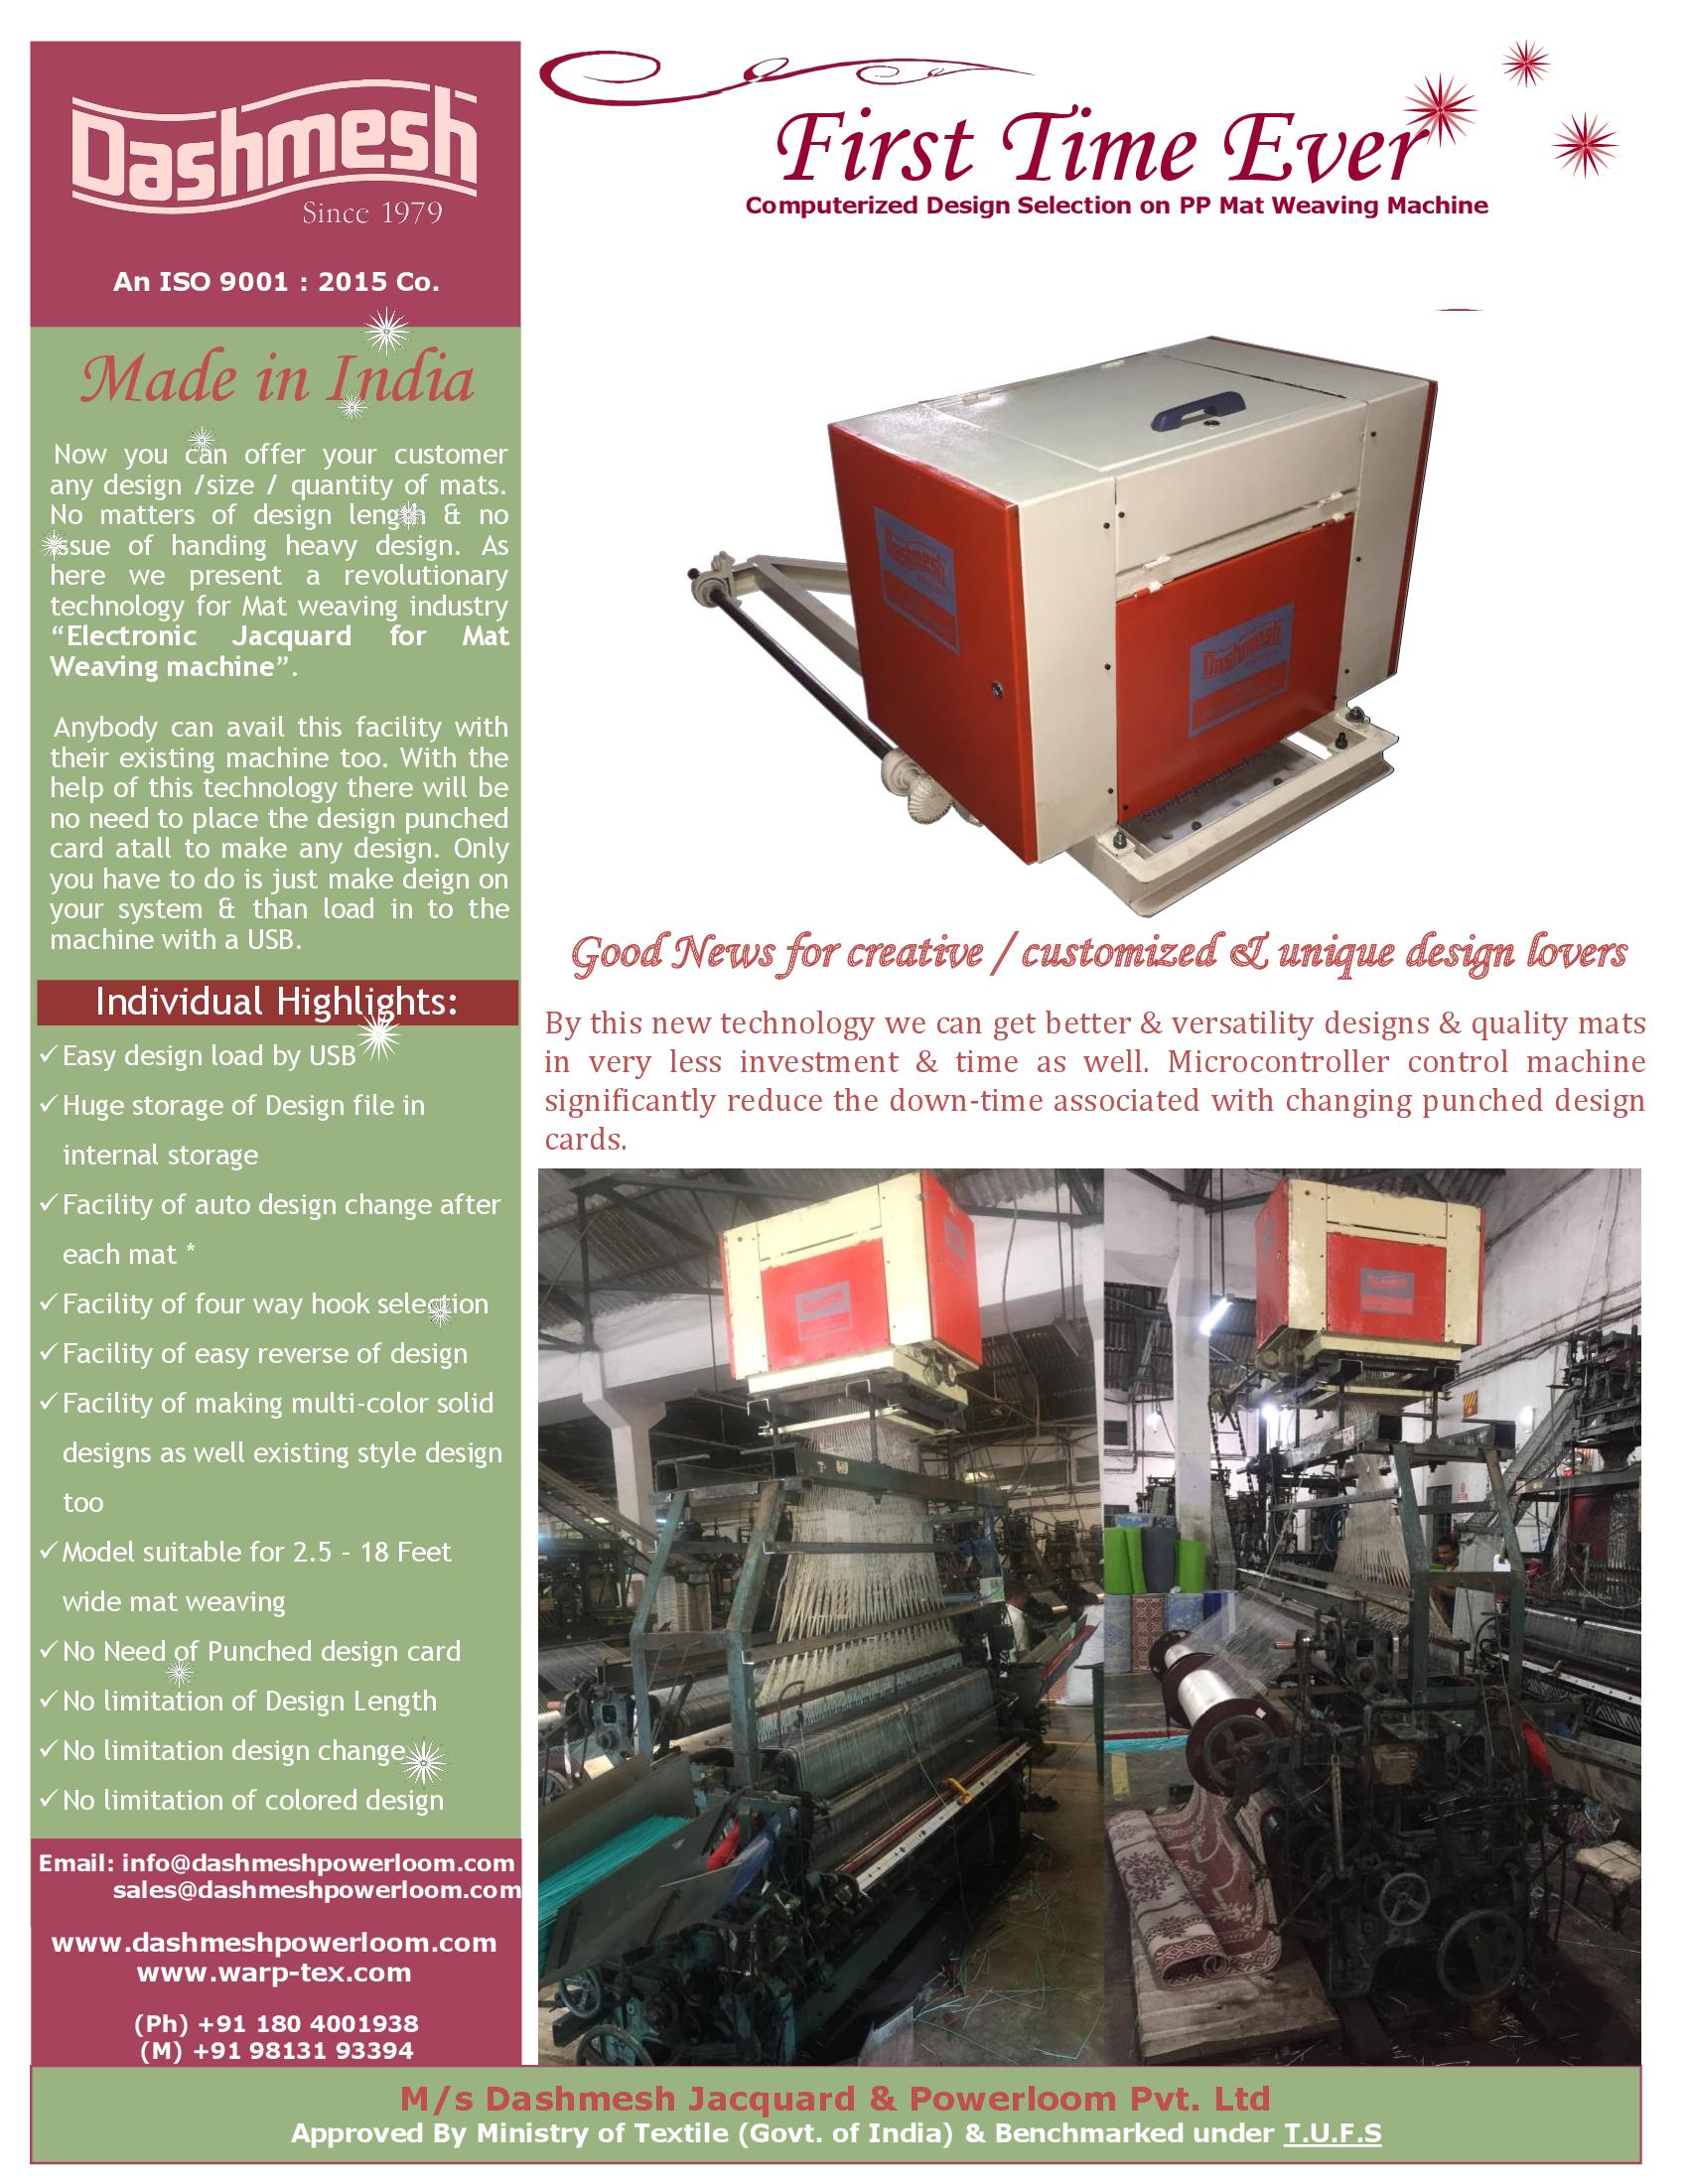 Articles: BROCHURE PP MAT WEAVING ELECTRONIC JACQUARD for